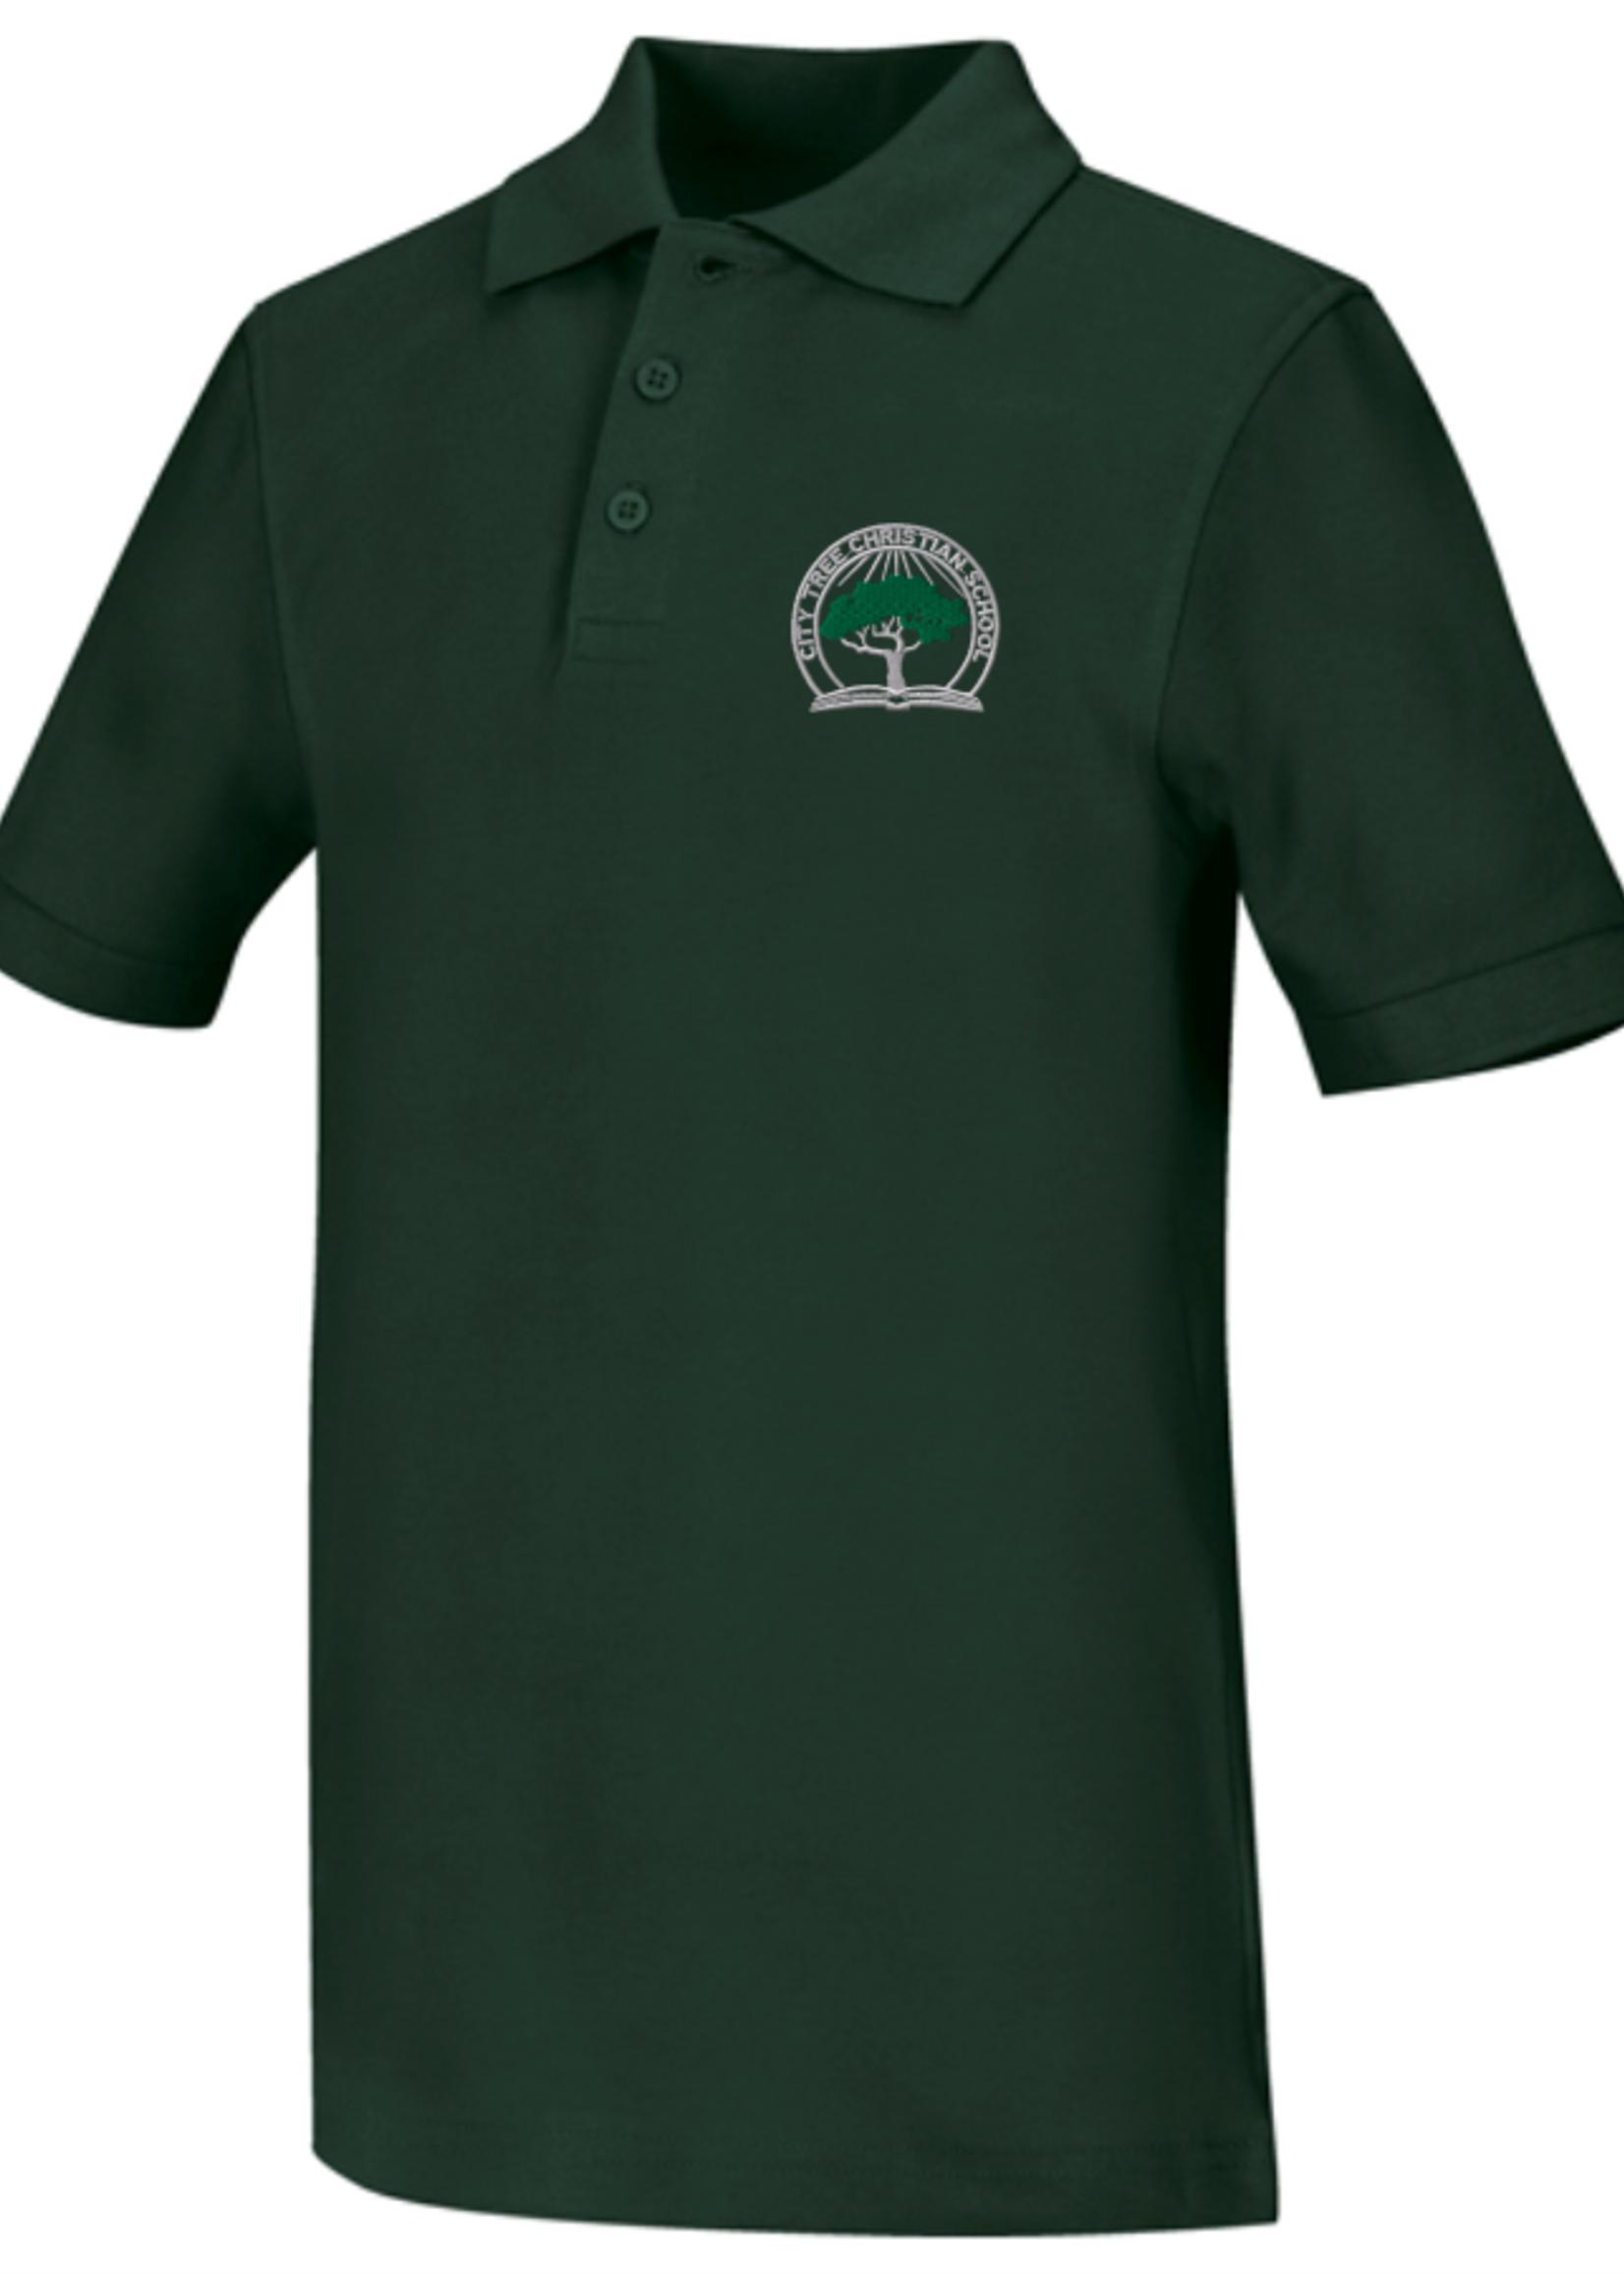 CTCS Value Short Sleeve Pique Polo